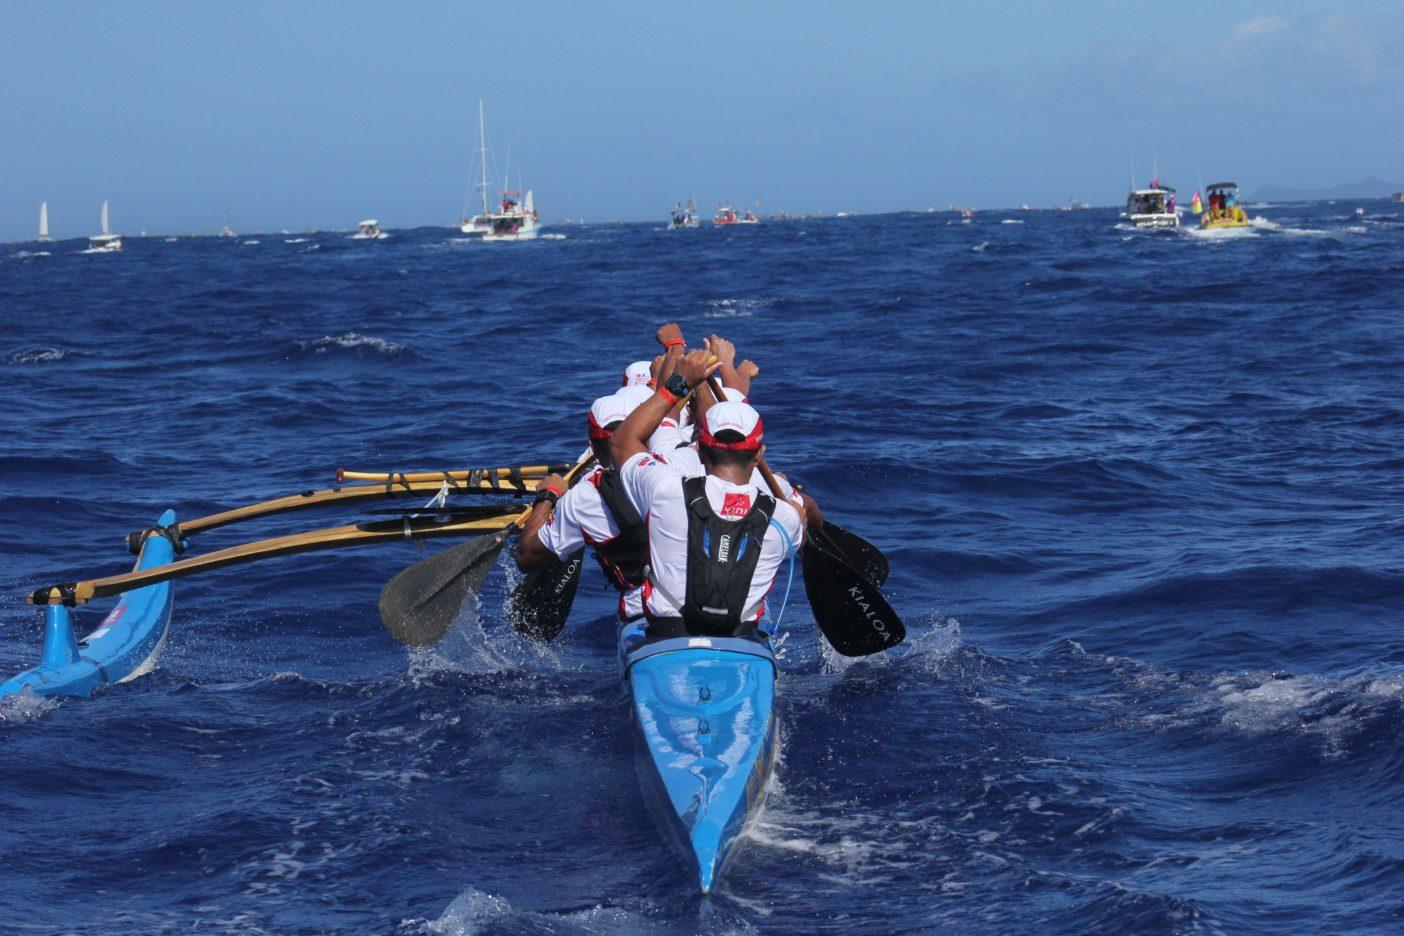 Bora Bora島を目指して。写真:金子ケニー